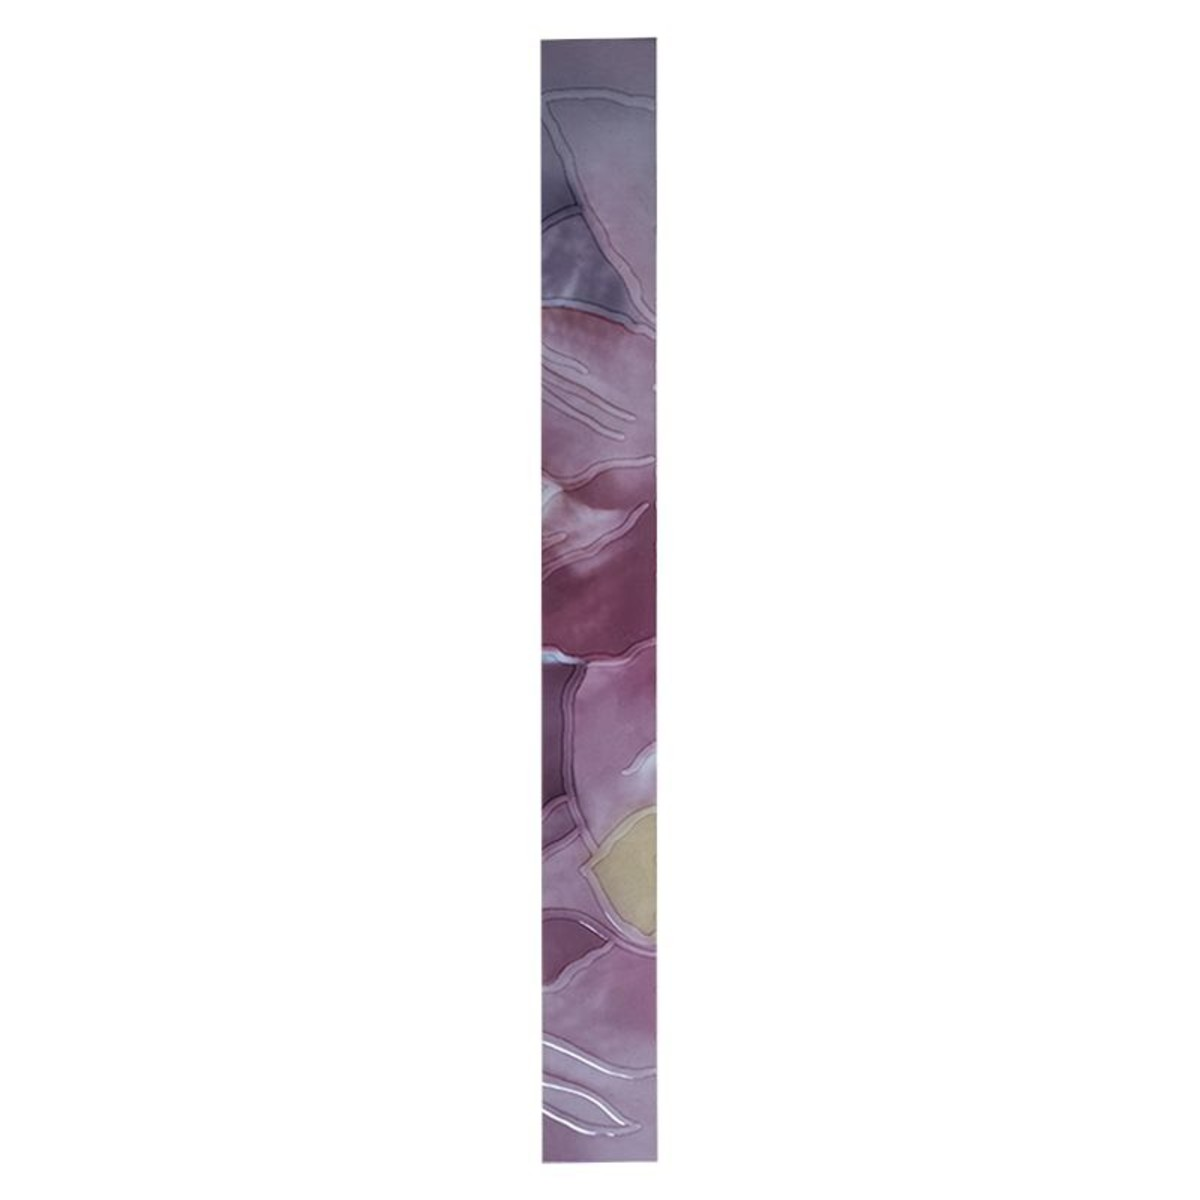 Бордюр «Жасмин 500 Climatis» 5х50 см цвет фиолетовый